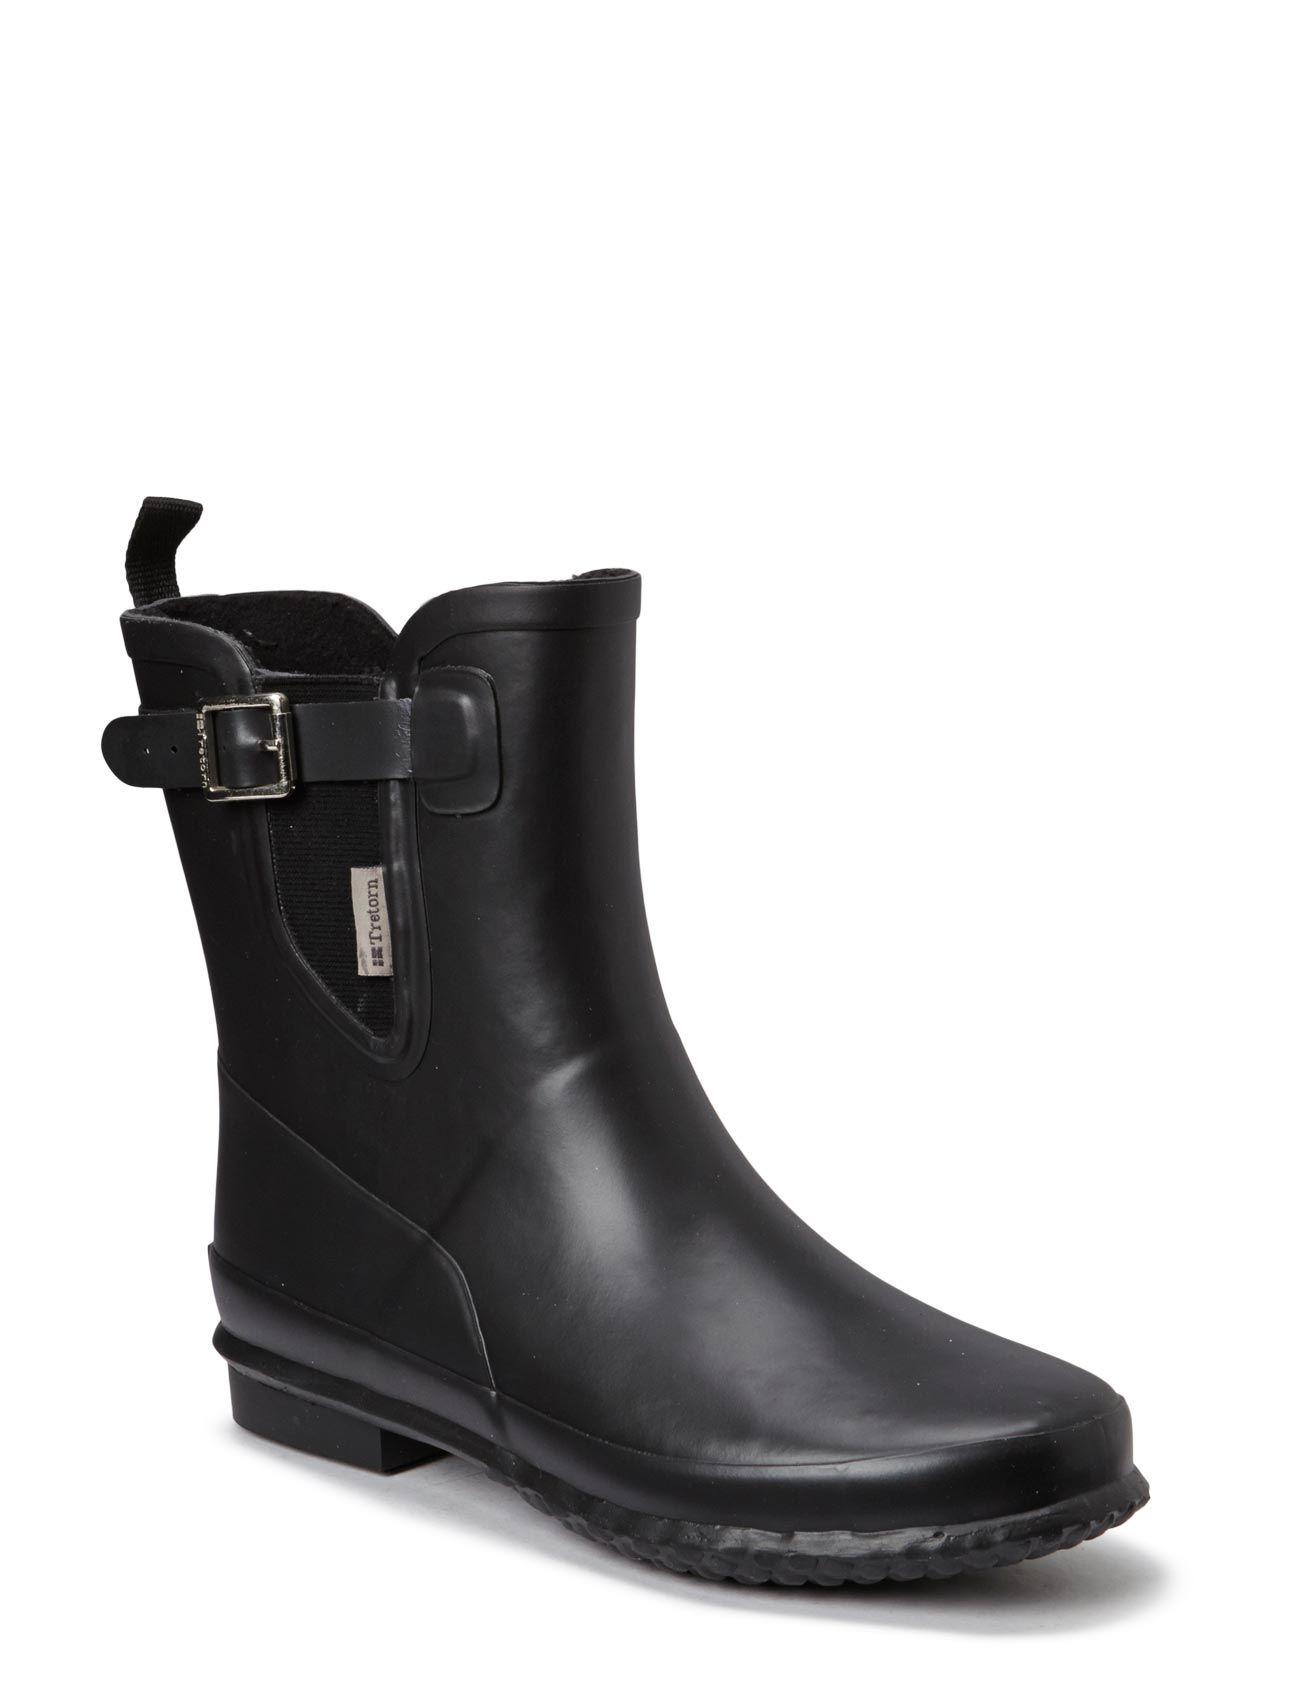 Nicole (Black) (75 €) - Tretorn - Schoenen  843c9644df